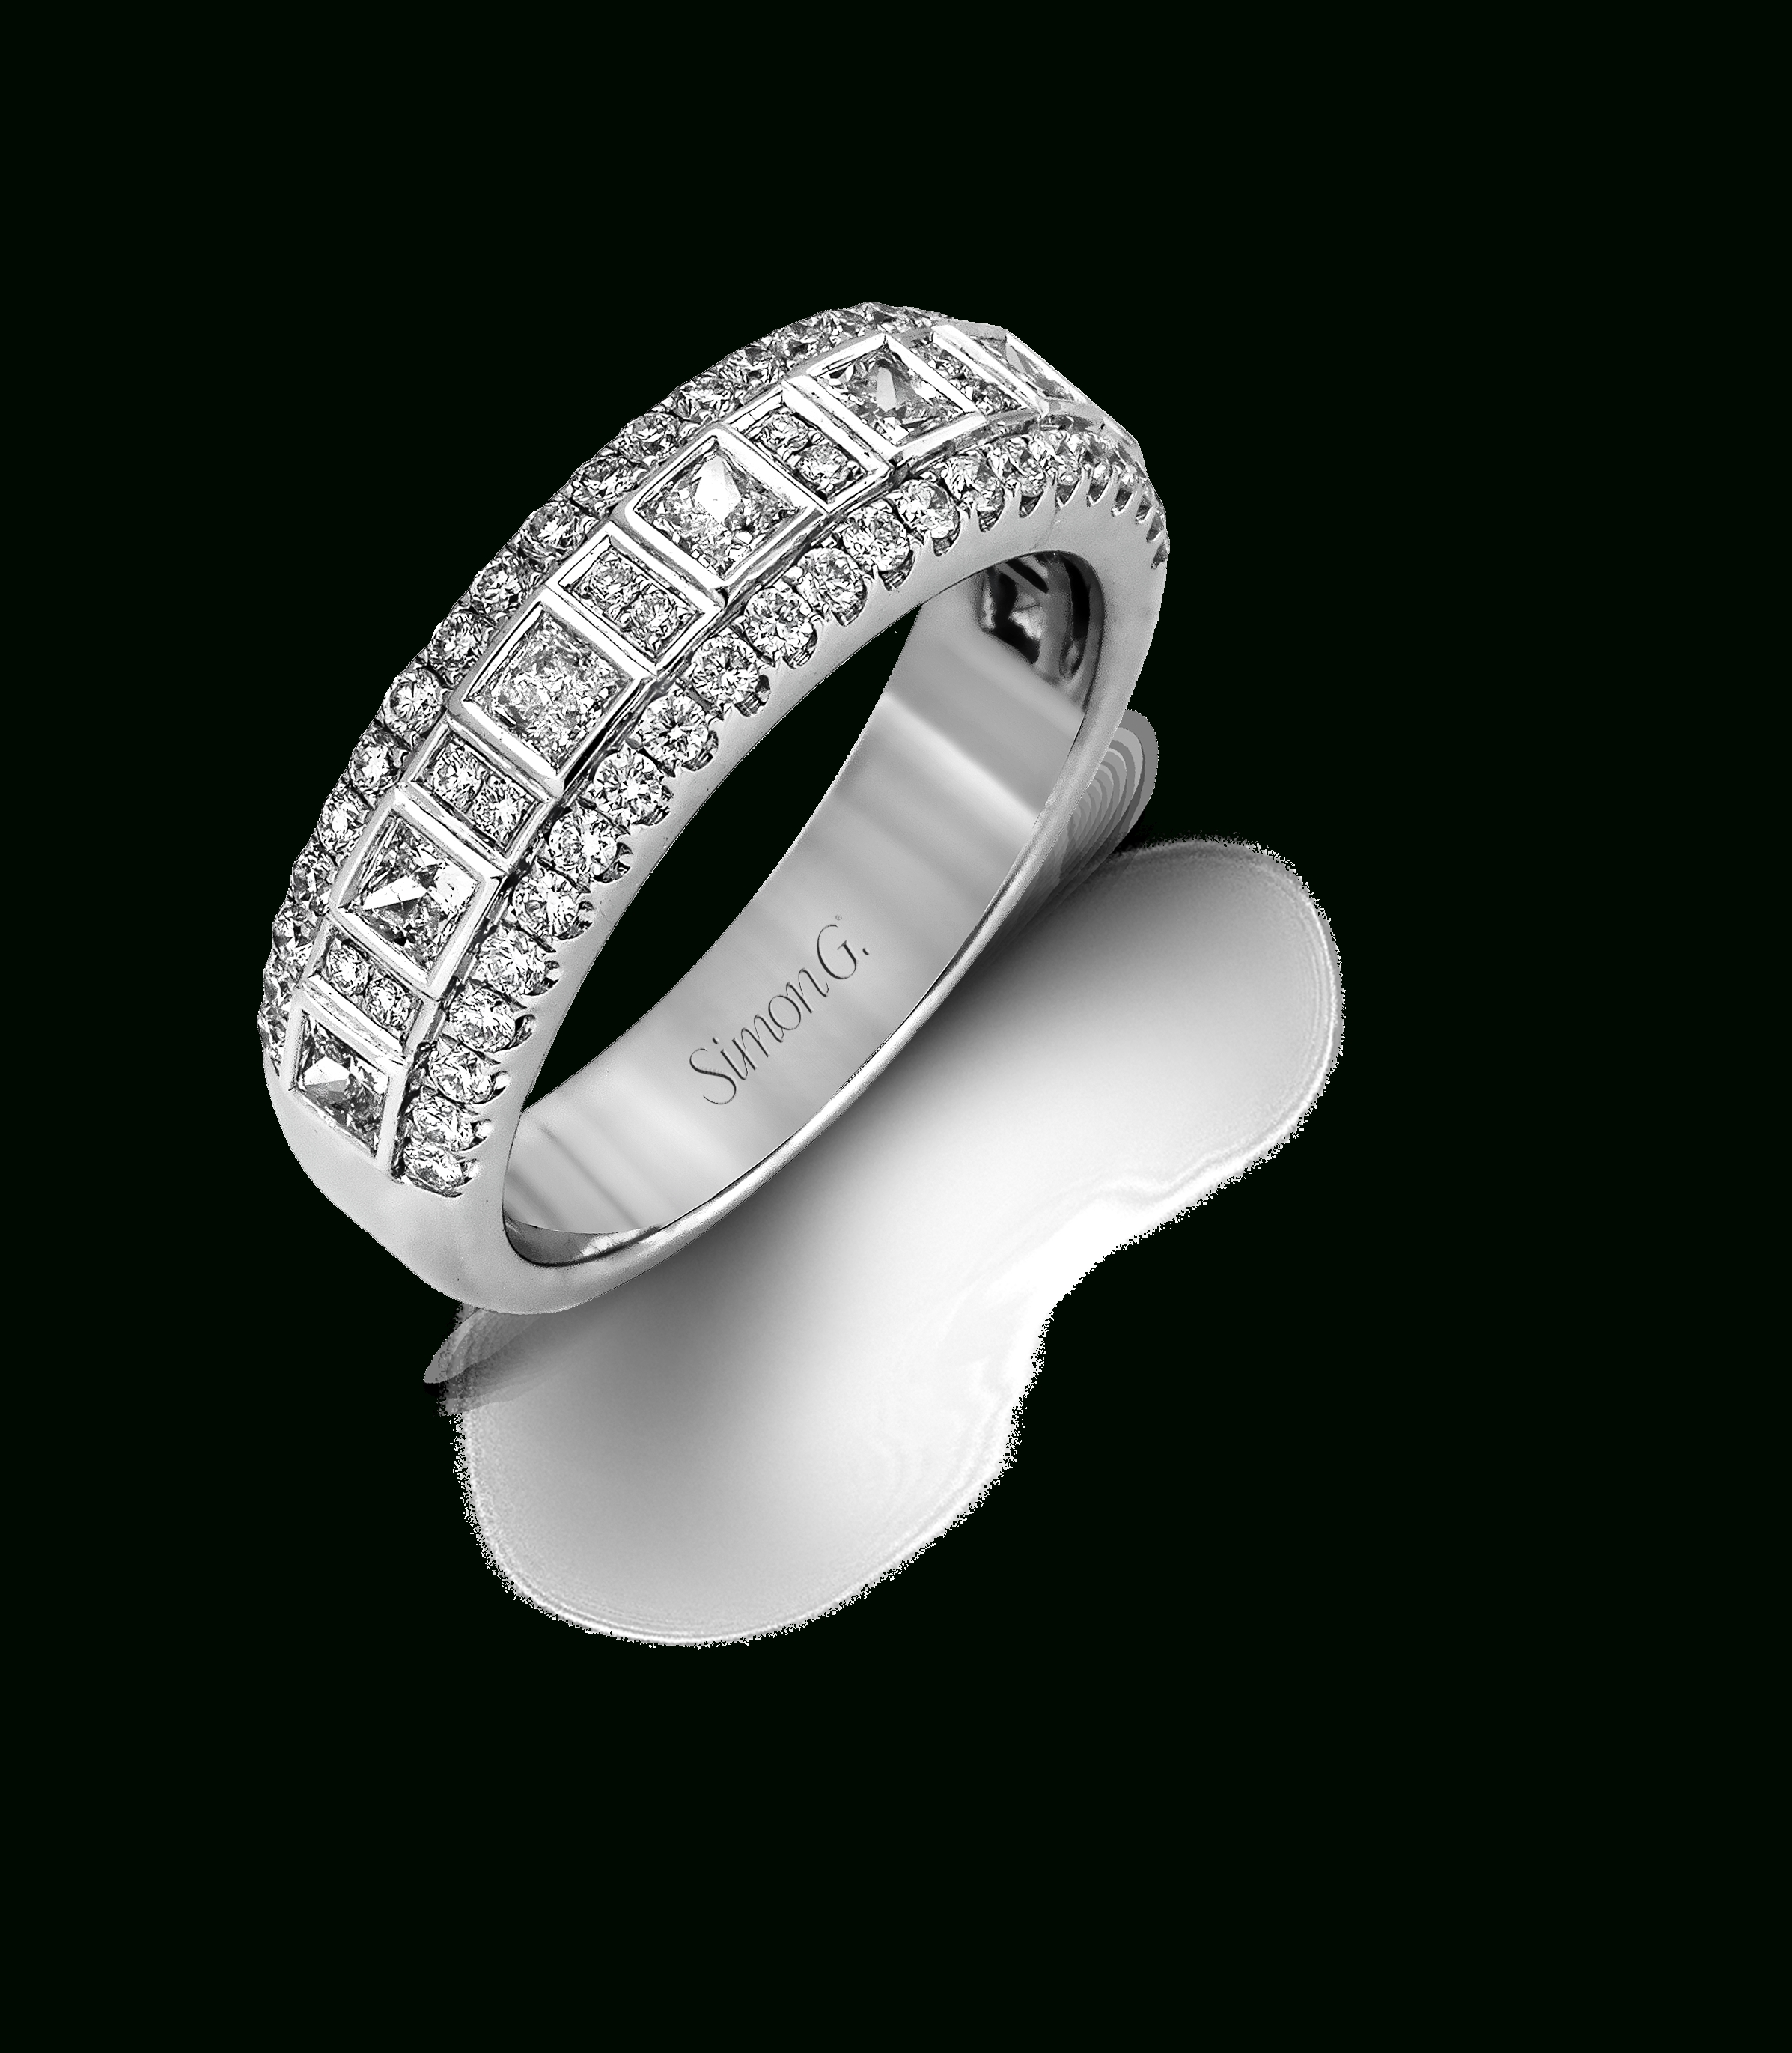 50Th Wedding Anniversary Diamond Rings Plus Anniversary Diamond In Most Recent Diamond Wedding Anniversary Rings (View 4 of 25)